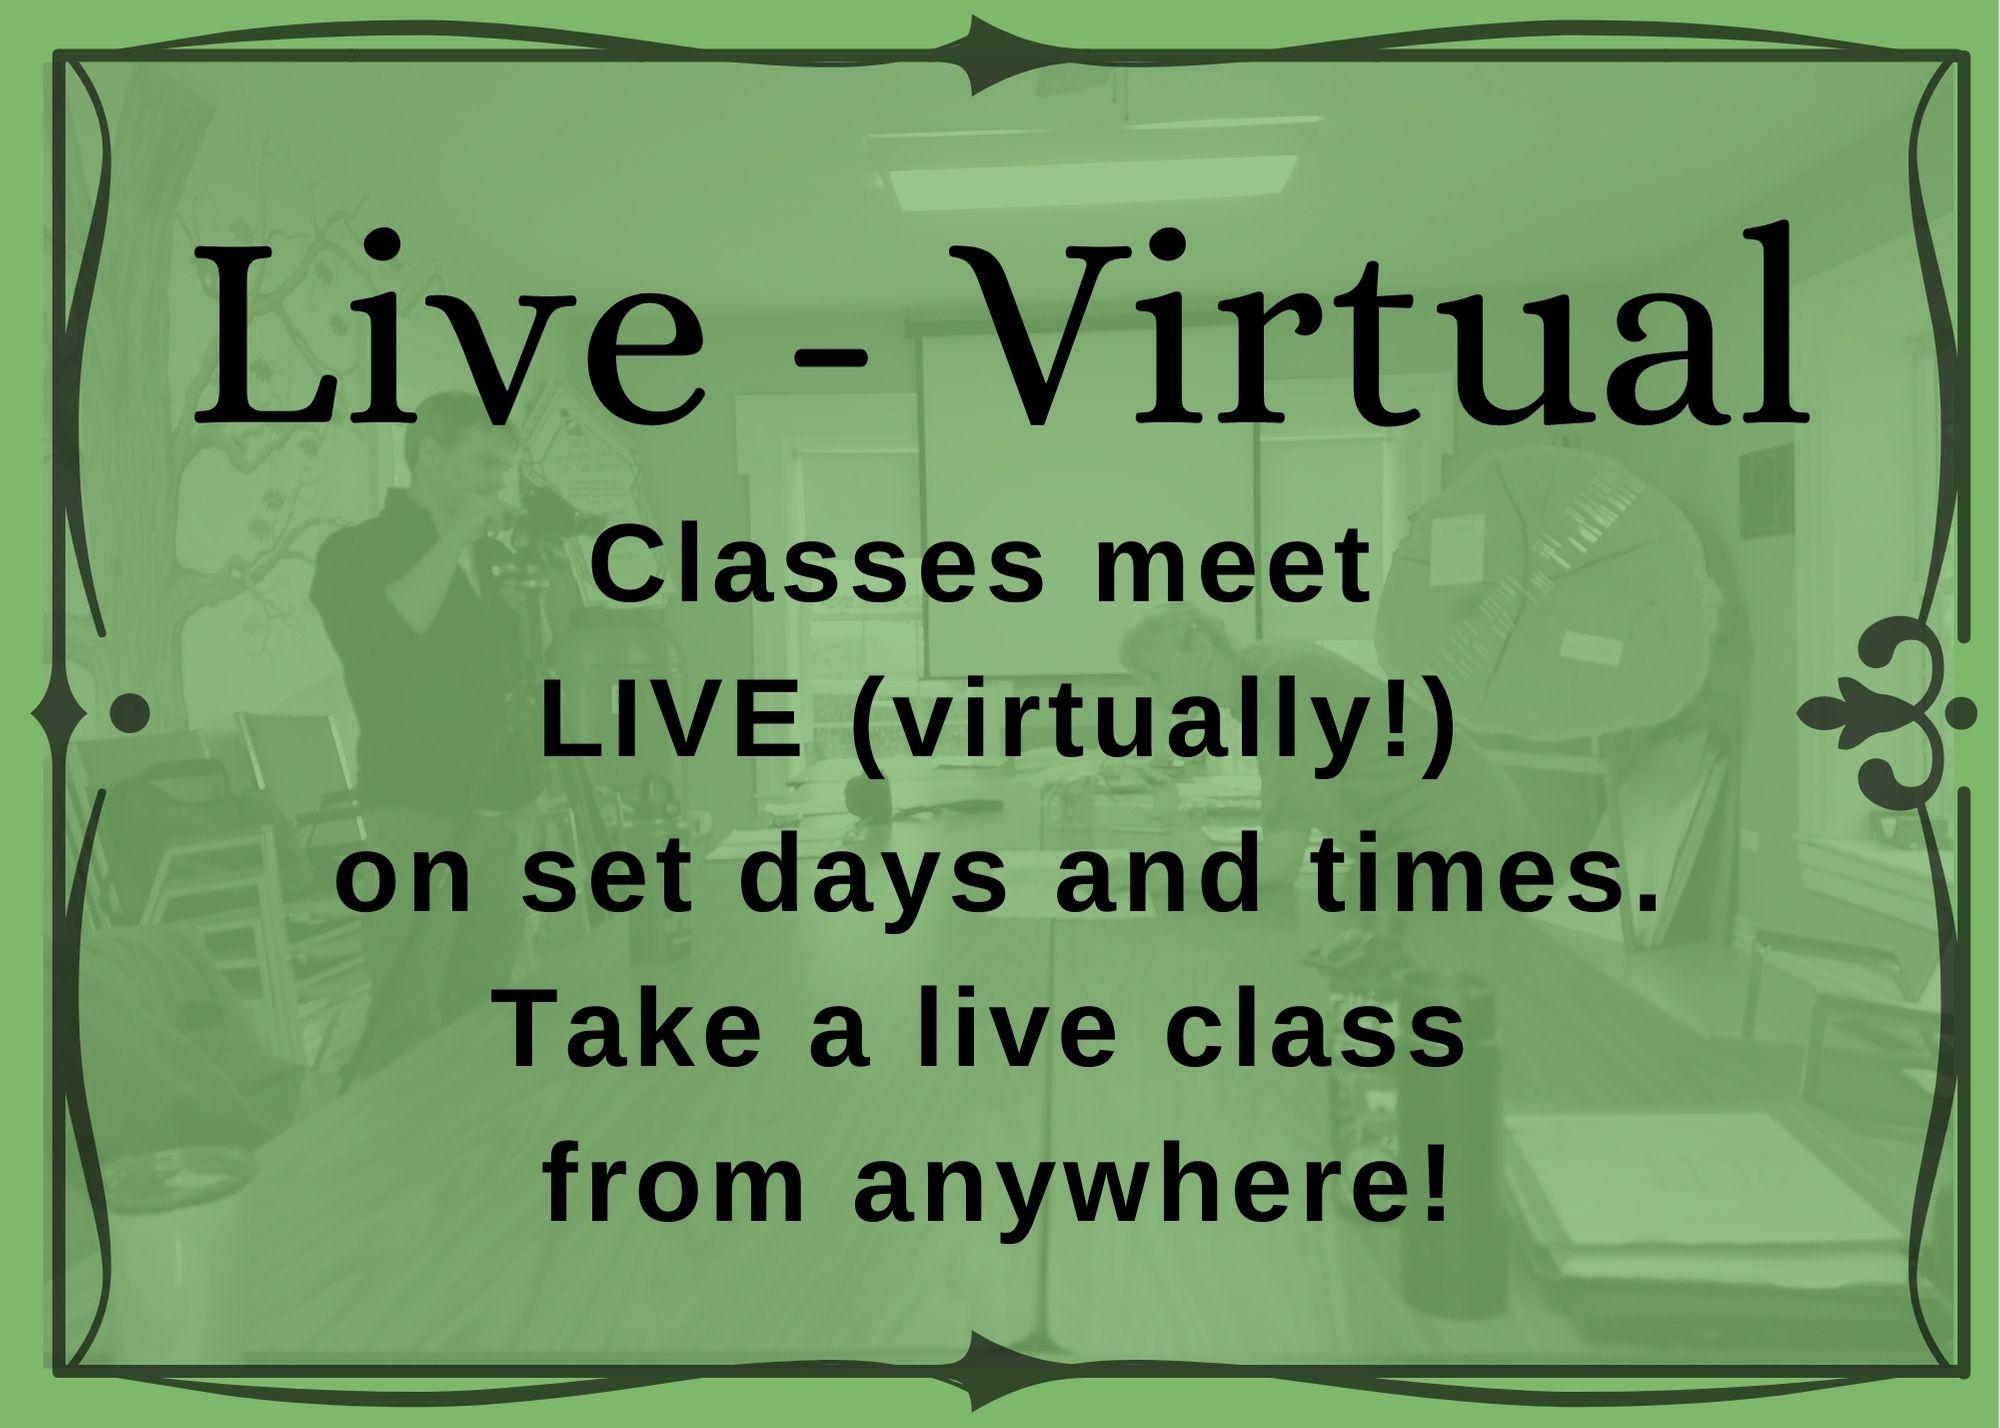 Live-Virtual